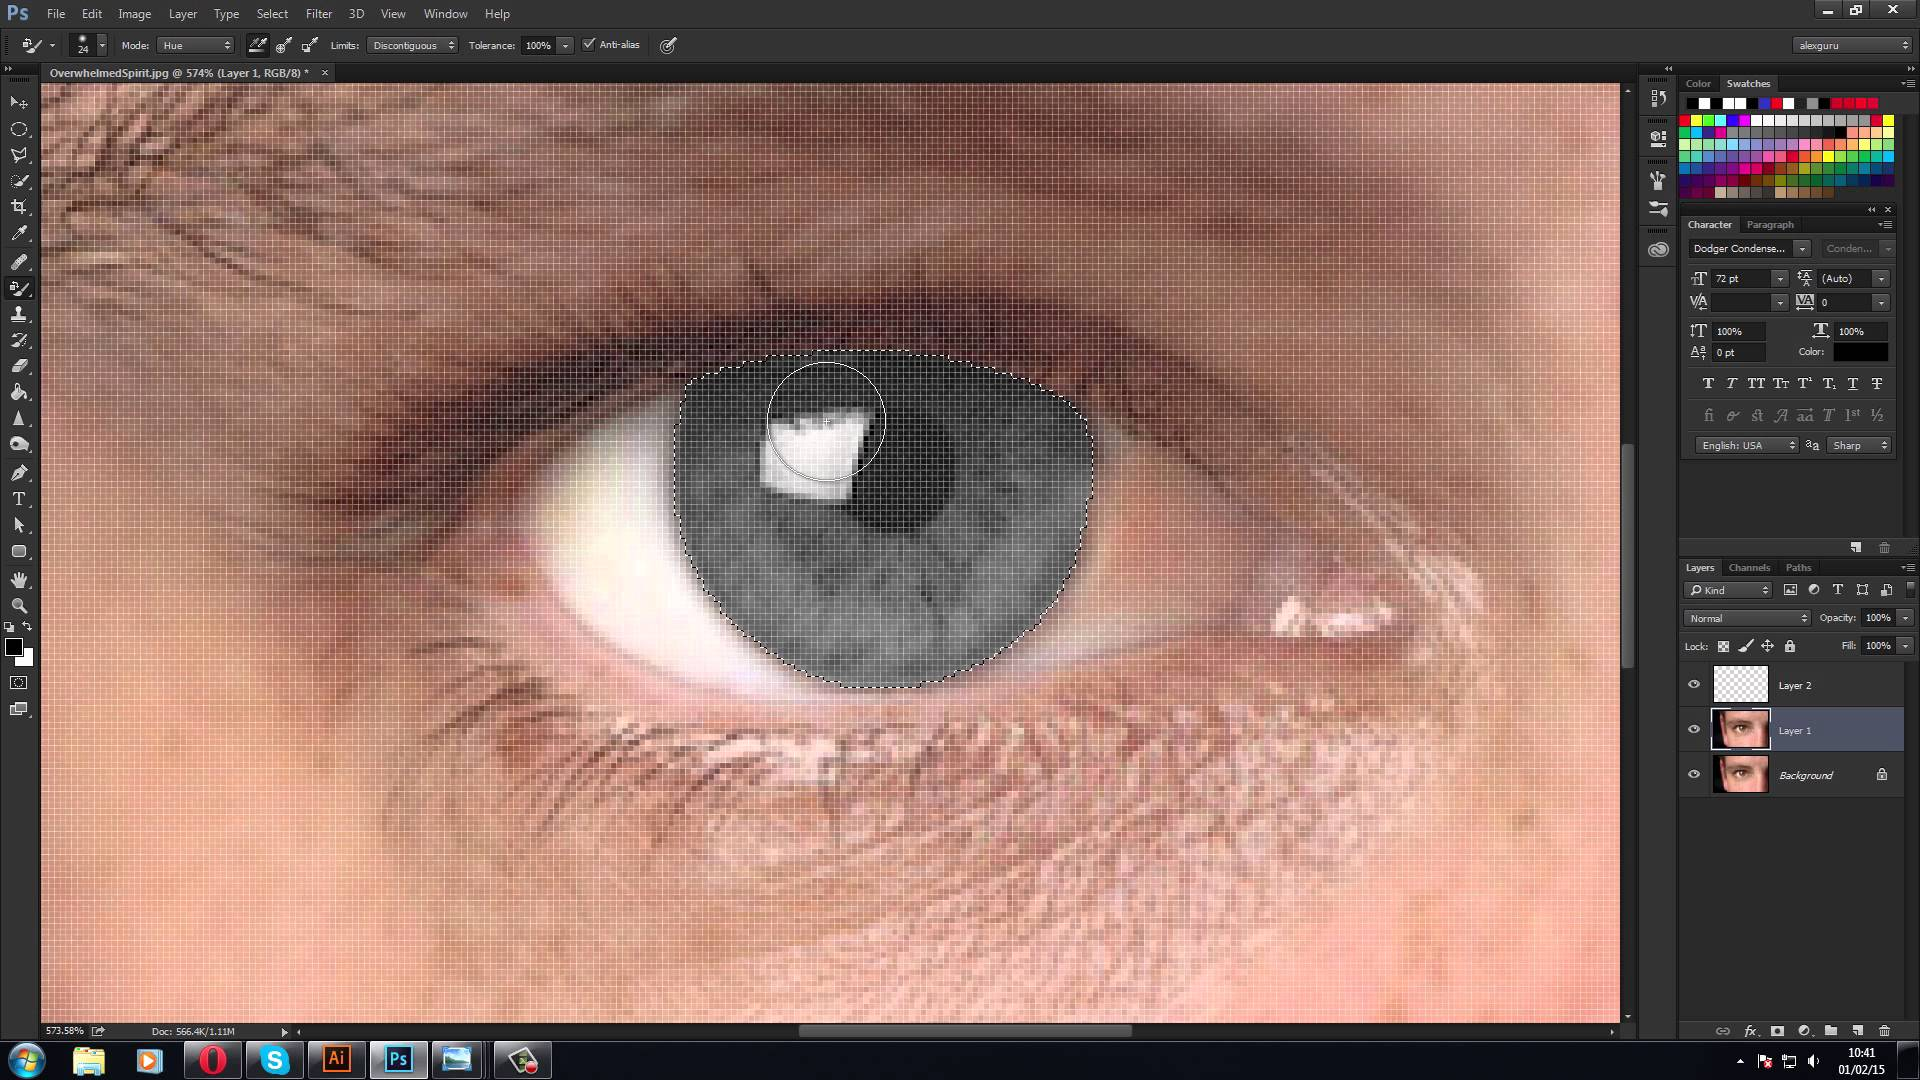 Cum aplicam efectul sharingan in Adobe Photoshop